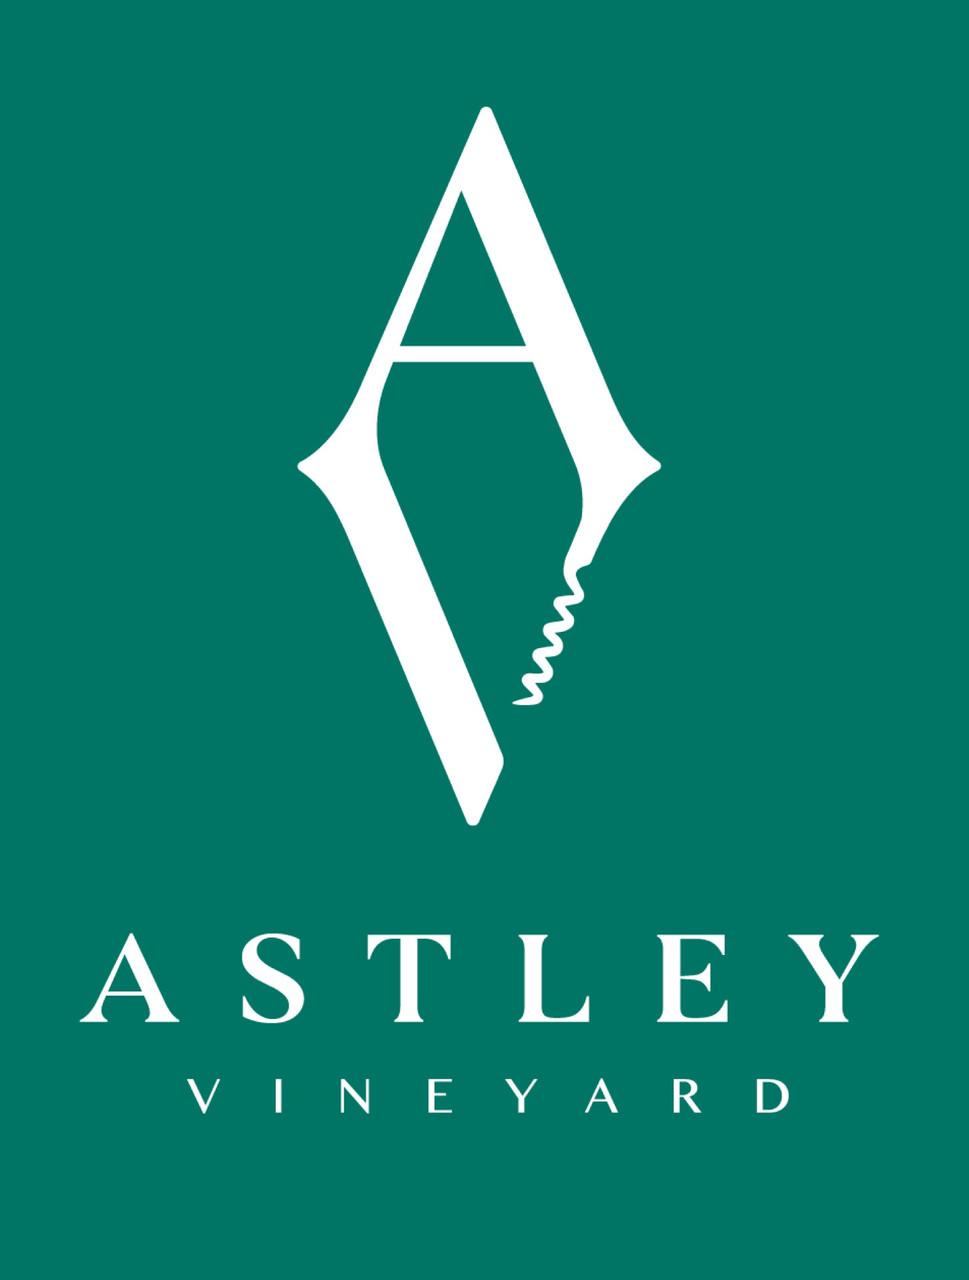 Astley Vineyard logo